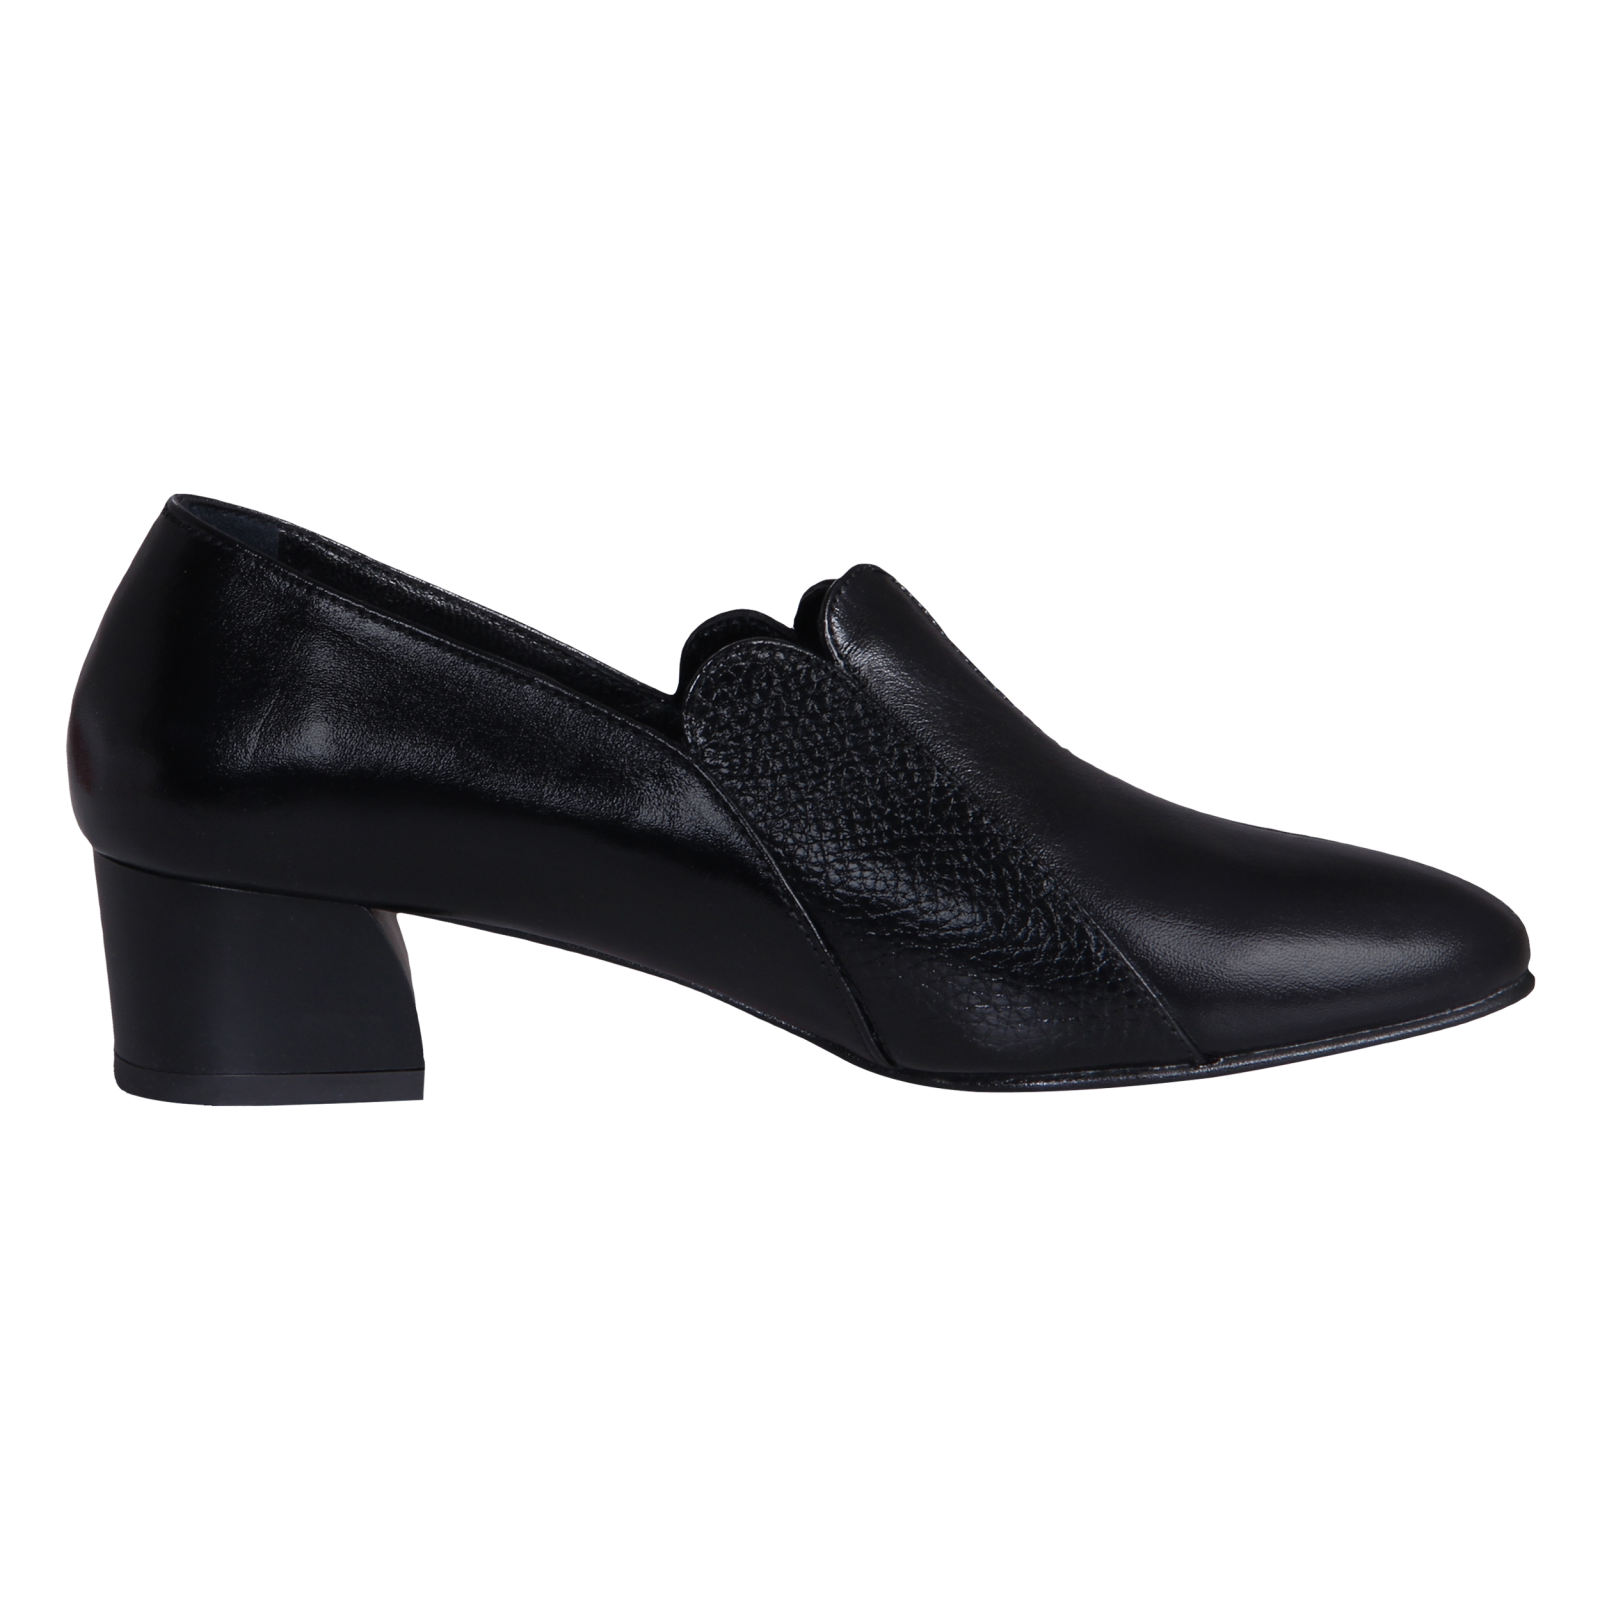 کفش زنانه شهر چرم کد 1-39969 -  - 2